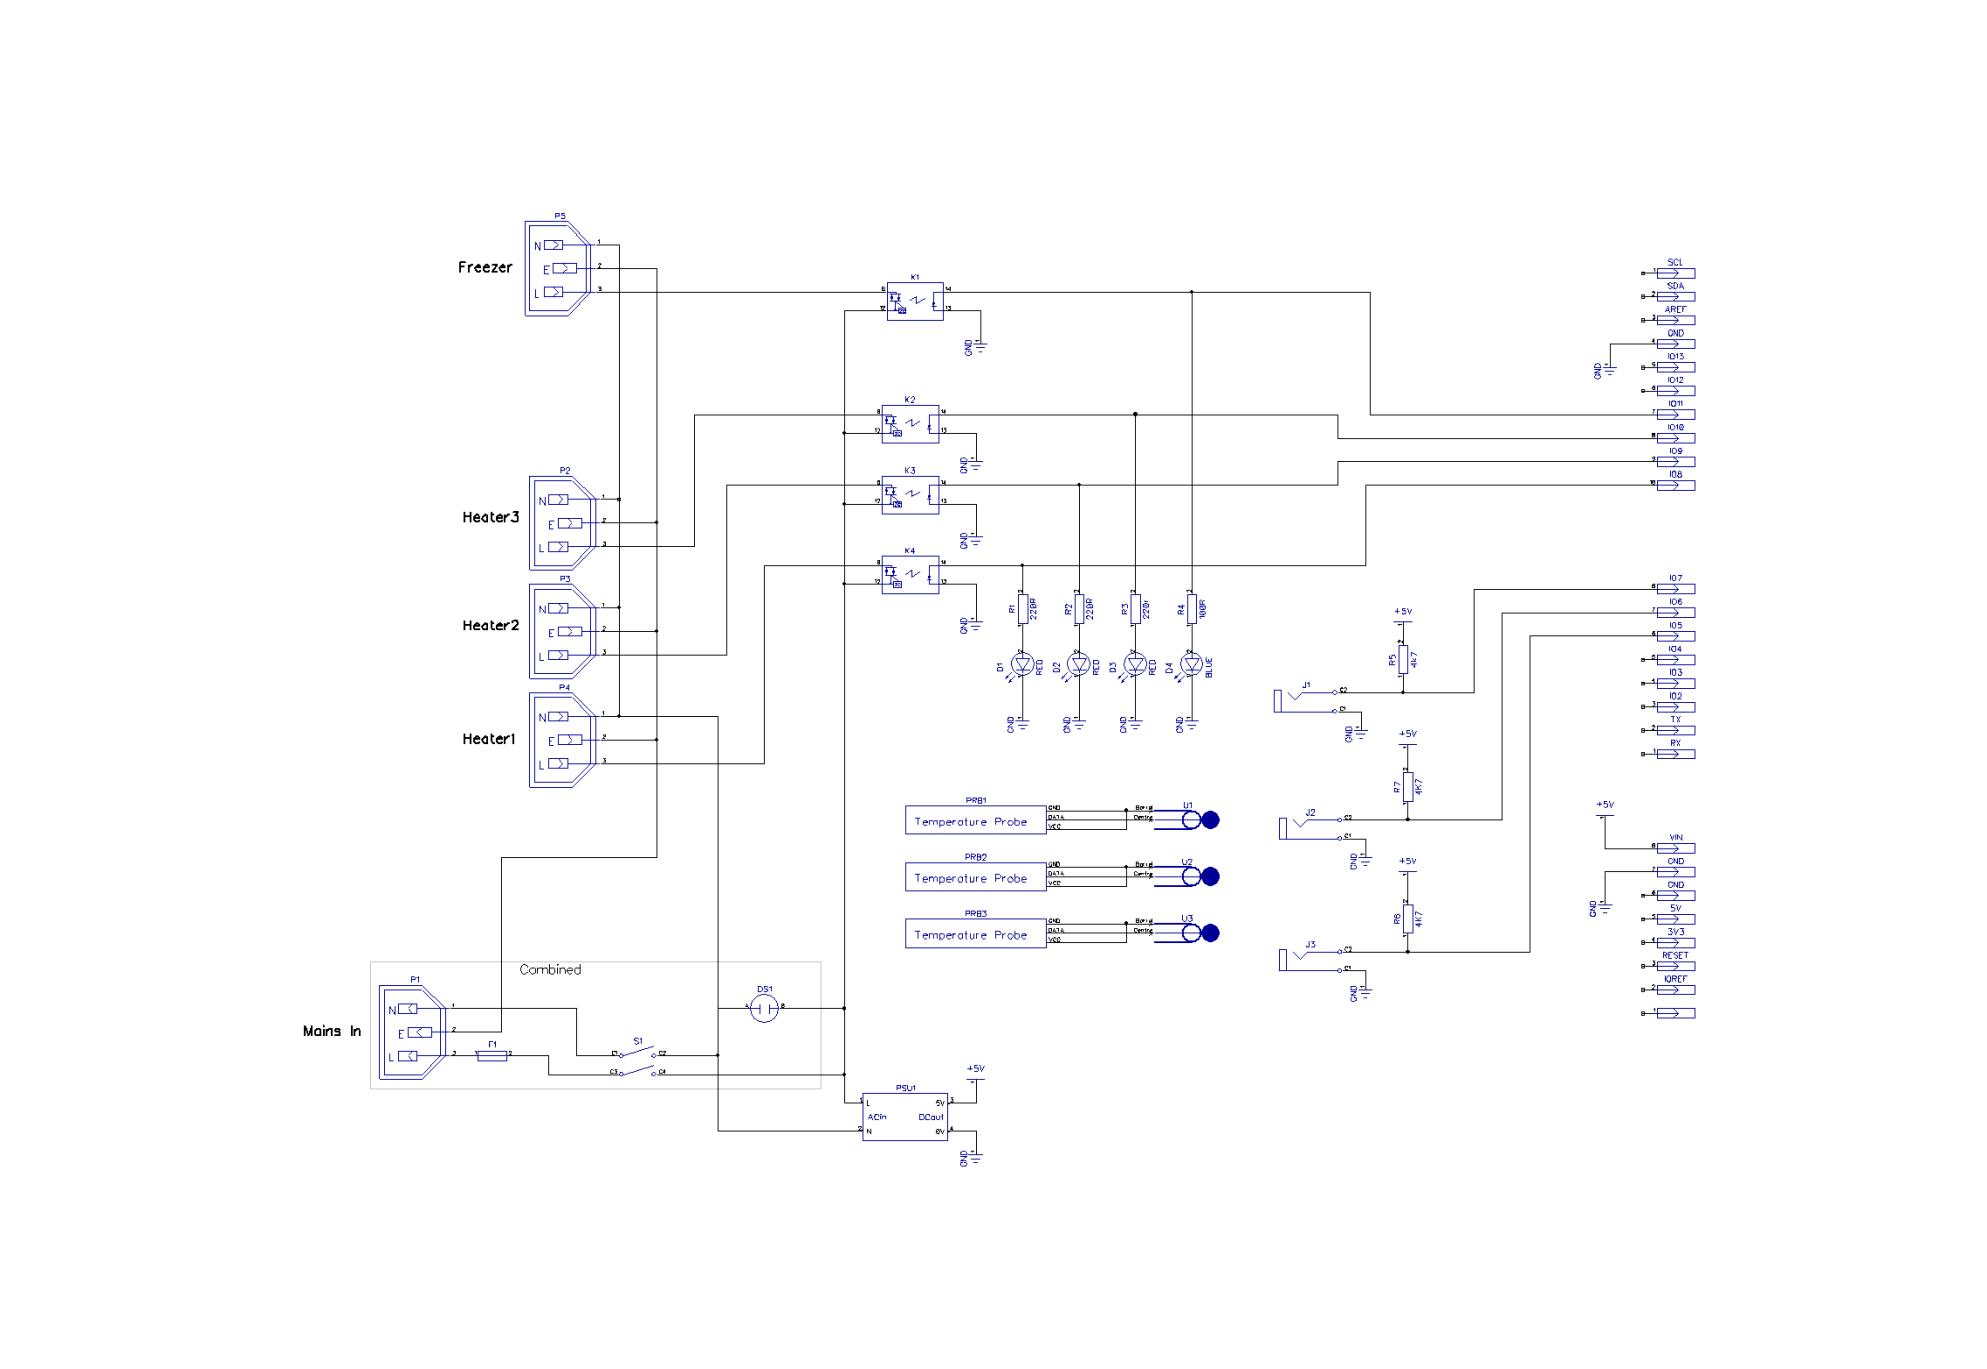 nhc fermentation controller